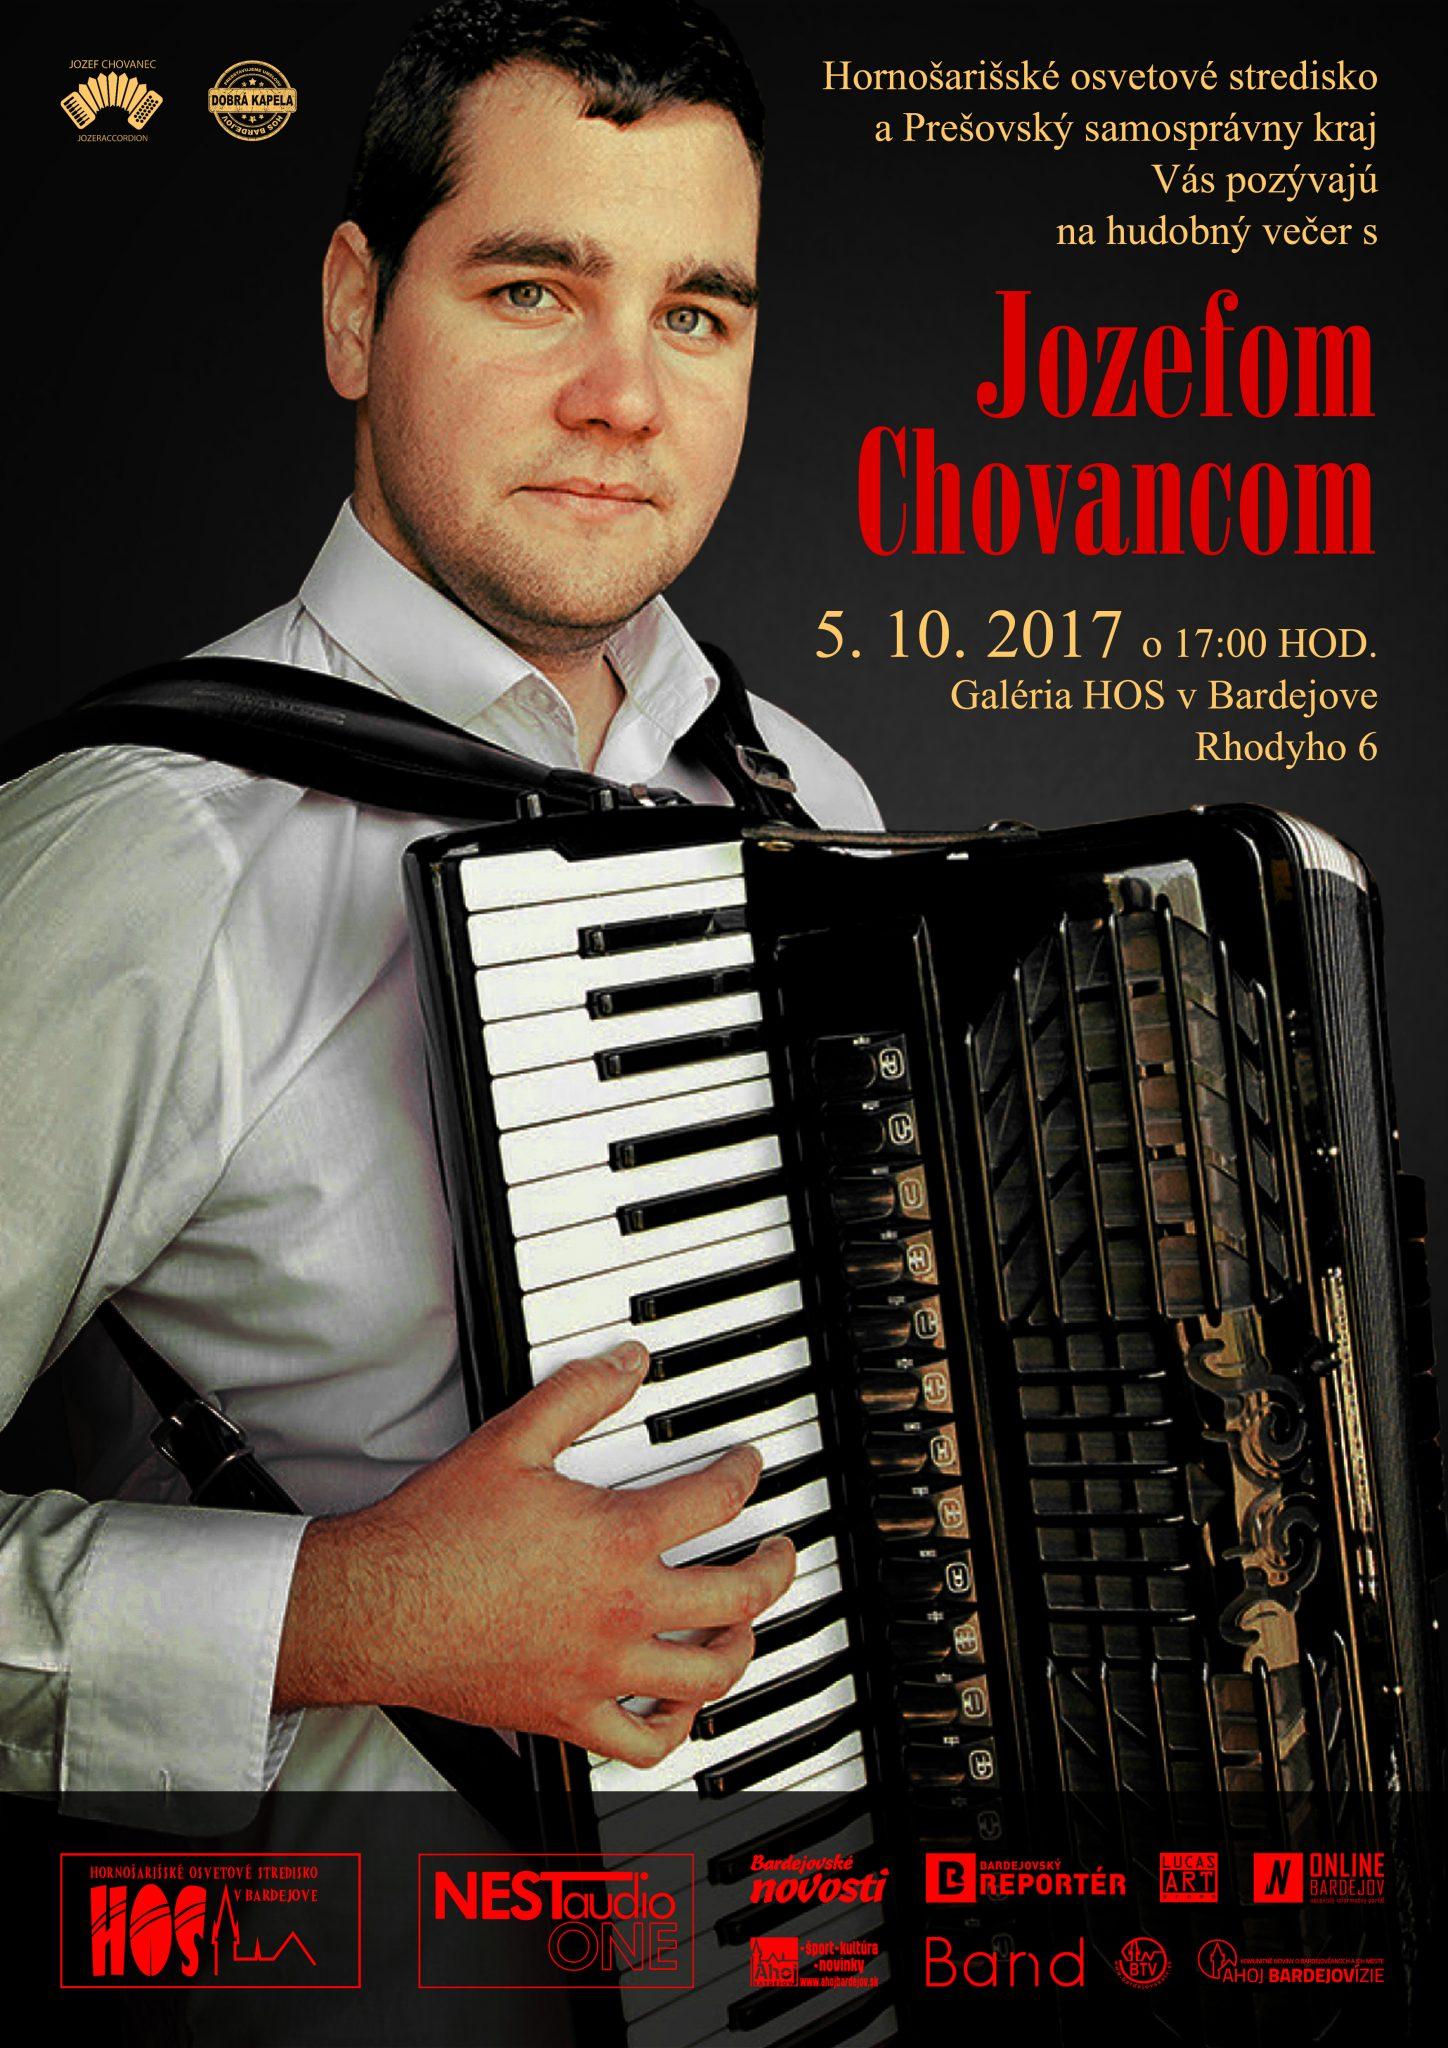 Hudobný večer s Jozefom Chovancom